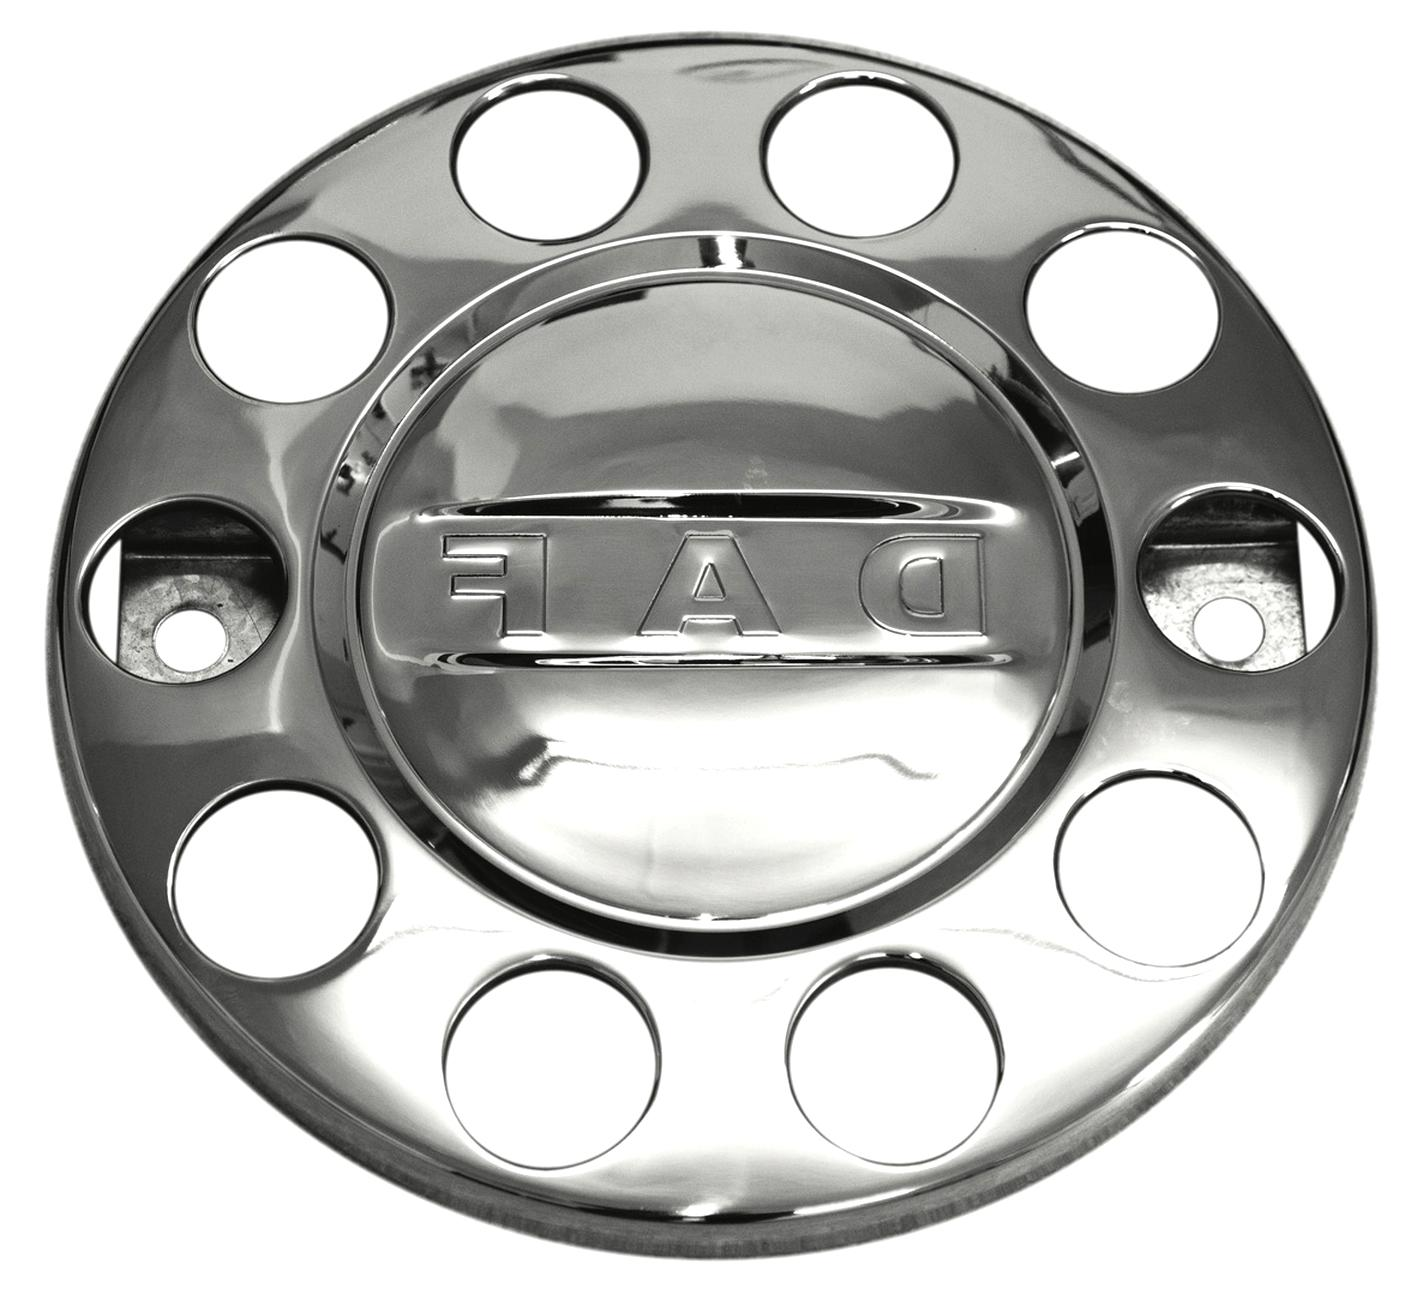 daf wheel for sale